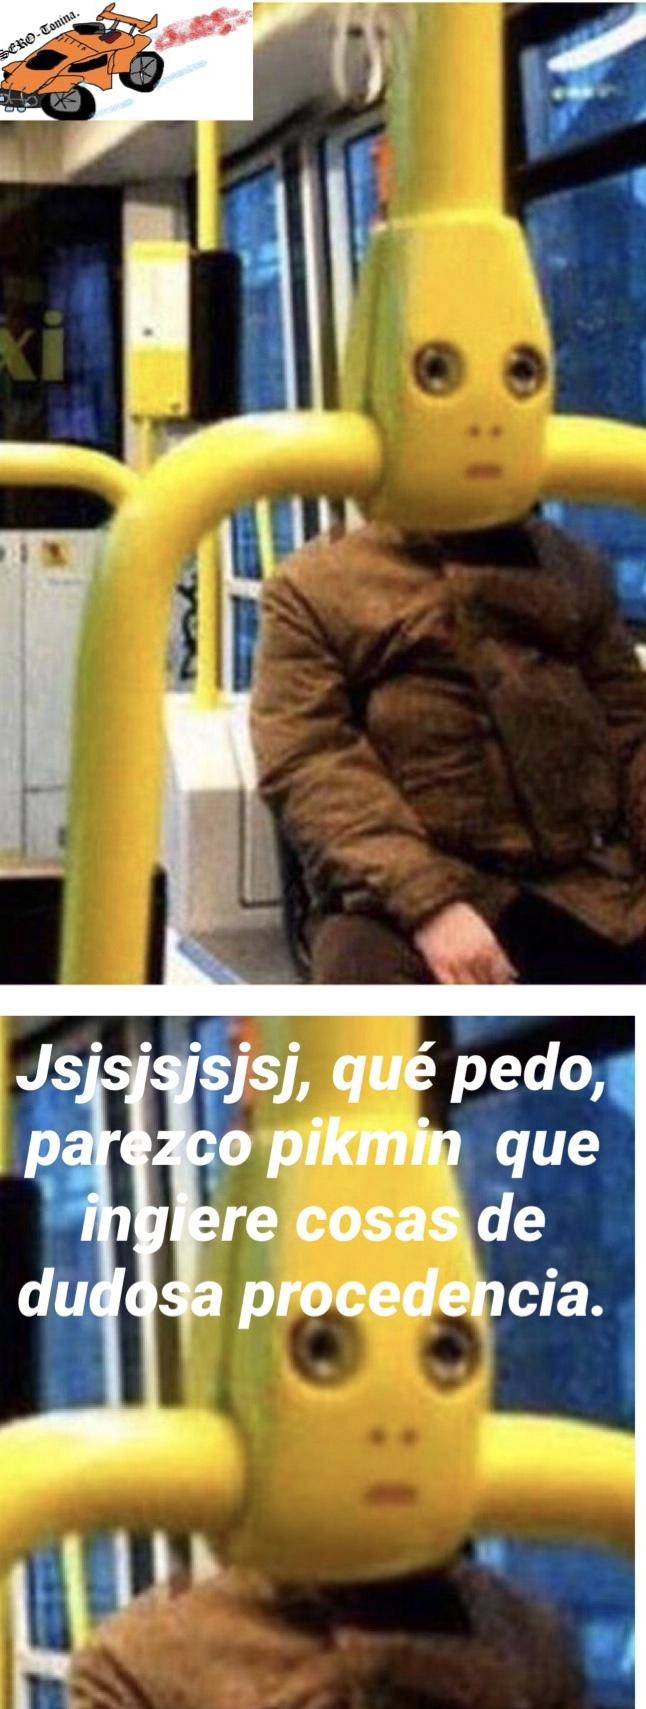 Re loco. - meme